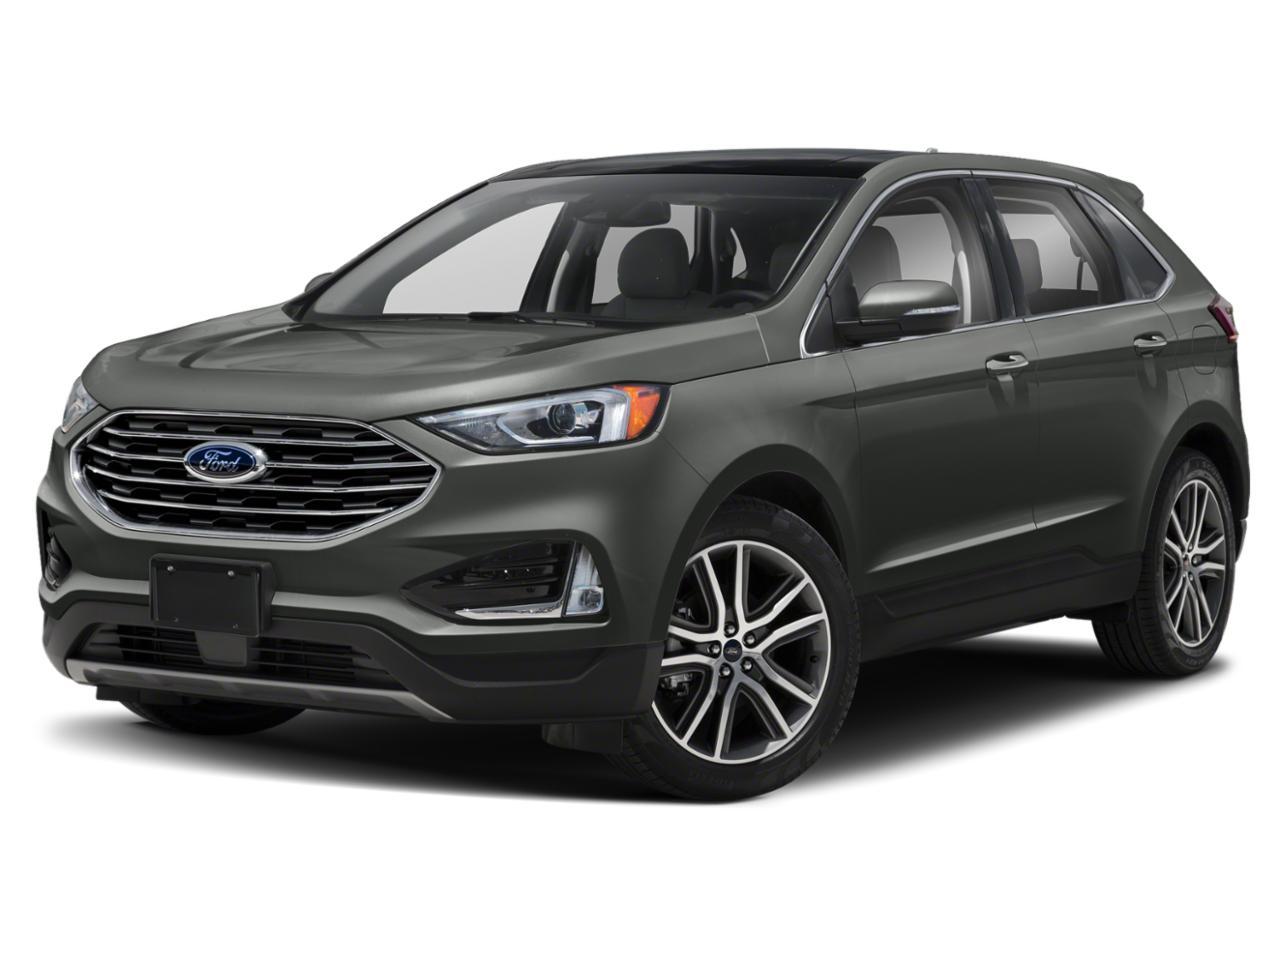 2019 Ford Edge Vehicle Photo in Saginaw, MI 48609